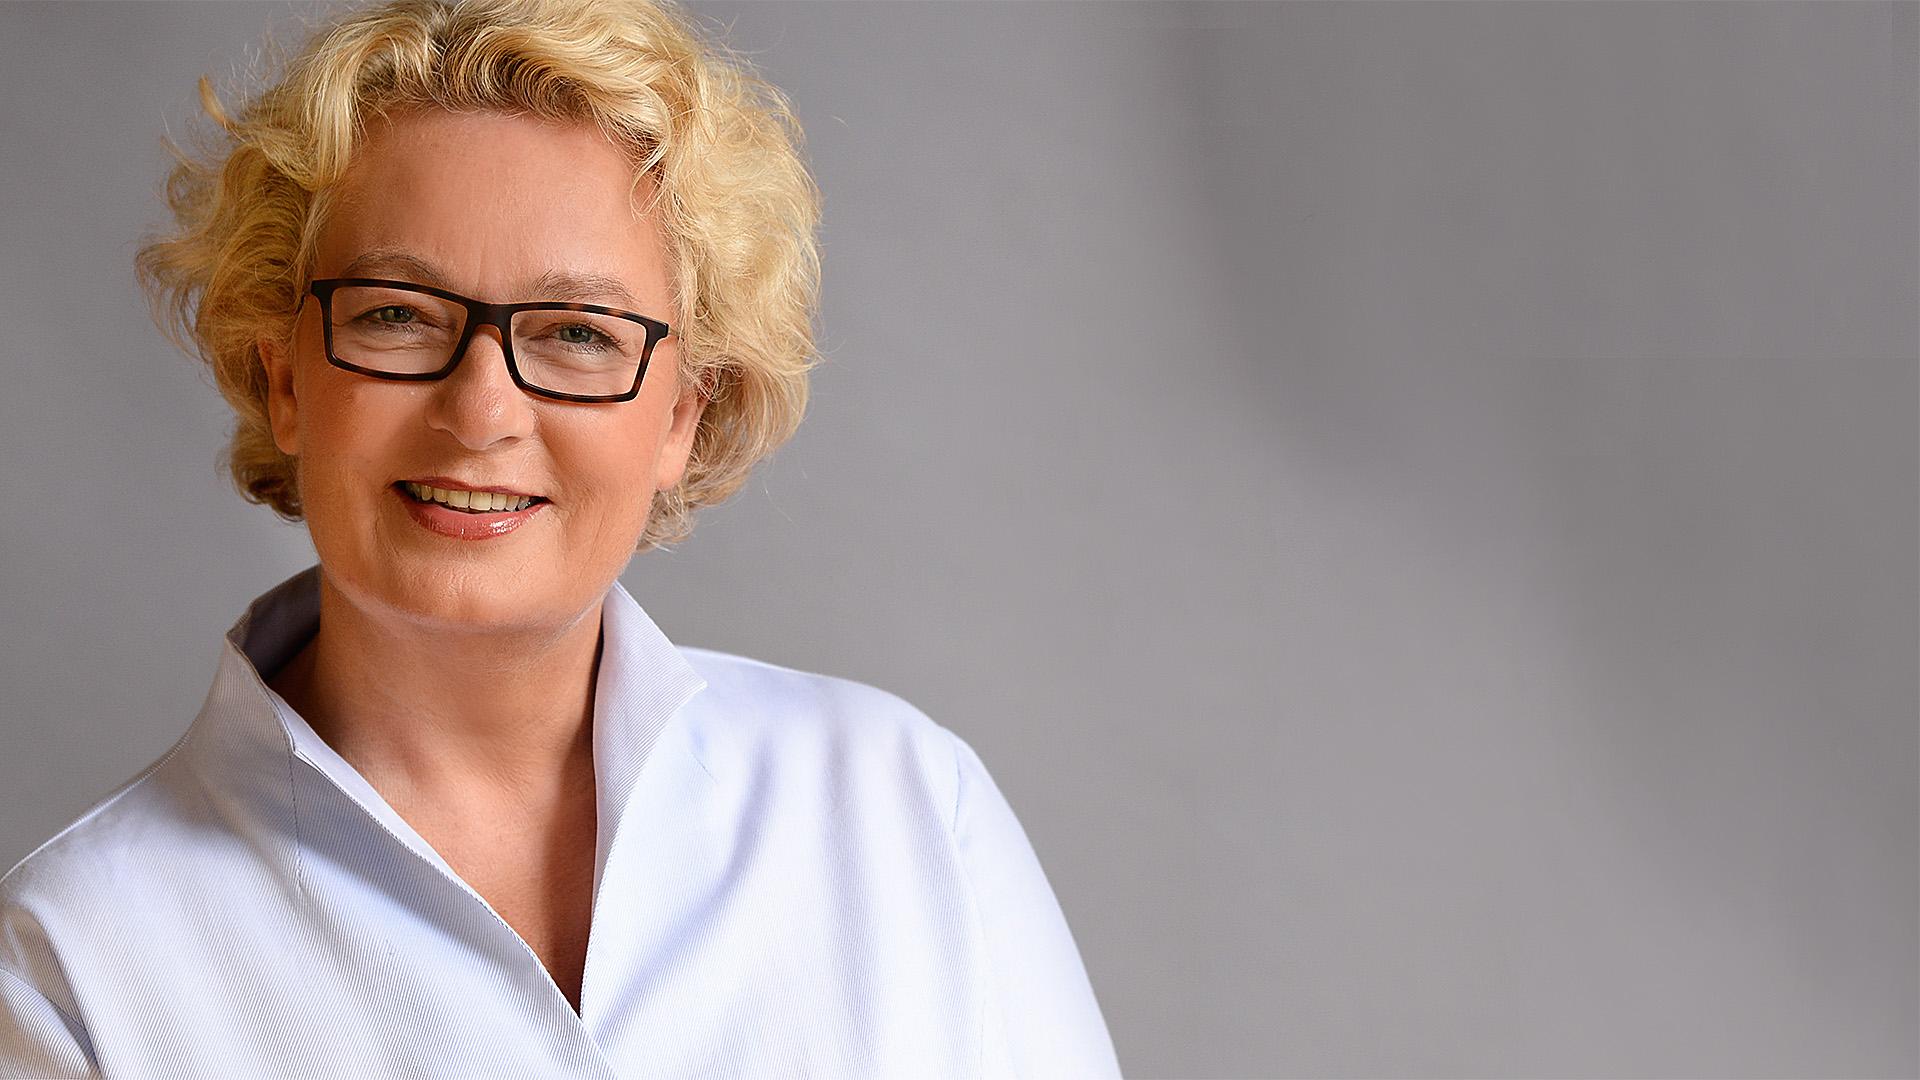 Eva coacht - Eva Hartmann Coaching & Consulting